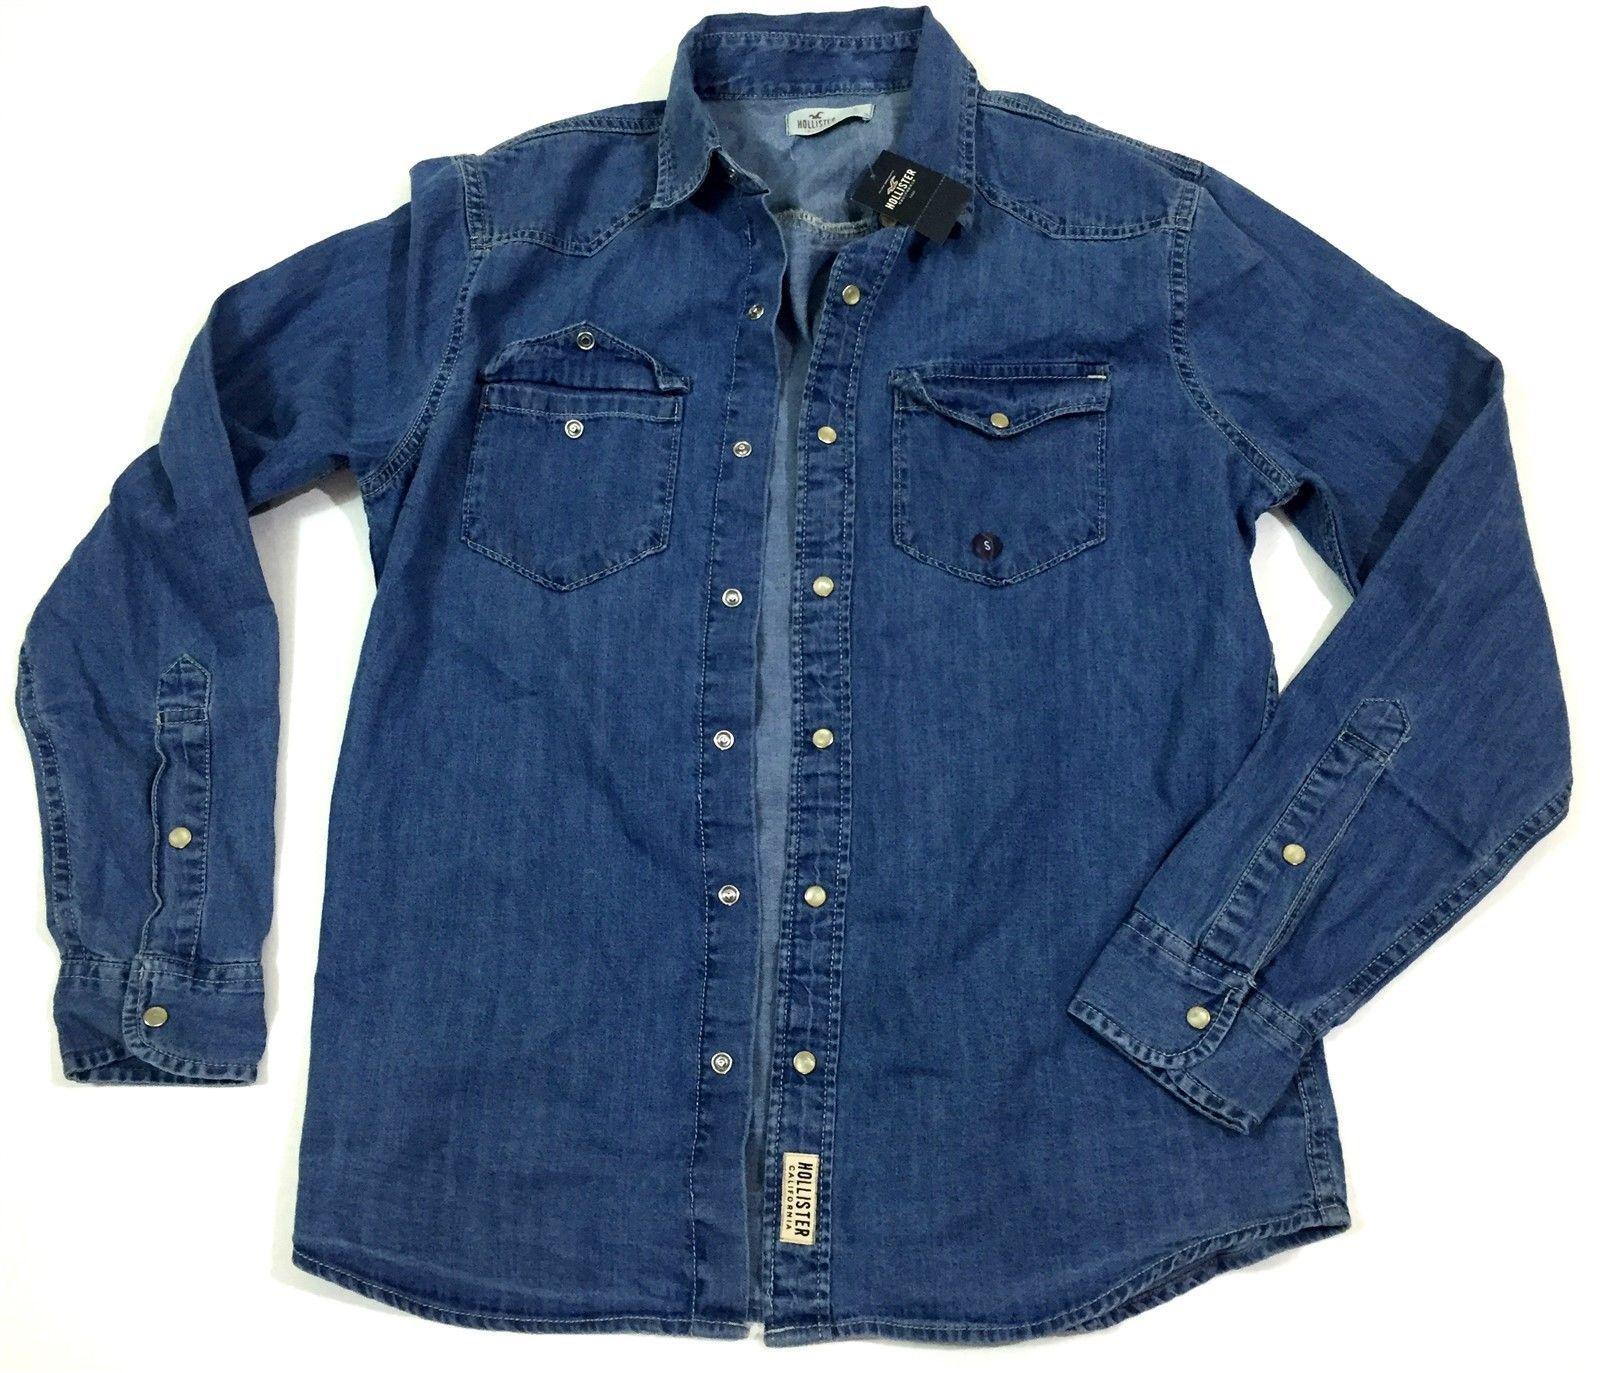 NWT HOLLISTER Long Sleeve Button Down Denim Jean Shirt Size Small $49.95 https://t.co/XGZ1b9Oo6q https://t.co/IGL4KkIQB3